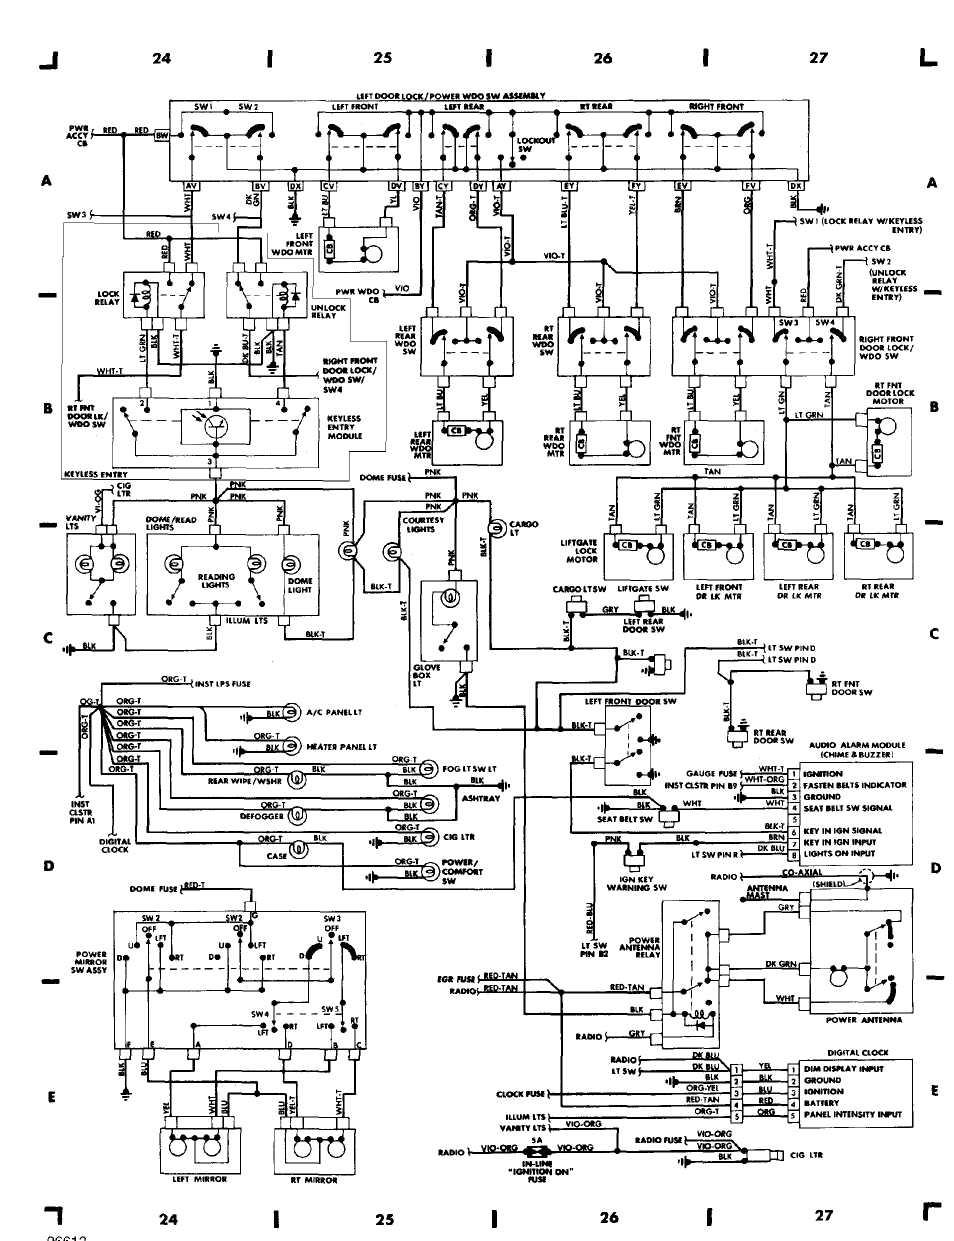 TO_8898] Wrangler Fuse Box Diagram On 1990 Jeep Wrangler 2 5 Engine Wiring  Free DiagramPhil Unec Ndine Garna Mohammedshrine Librar Wiring 101